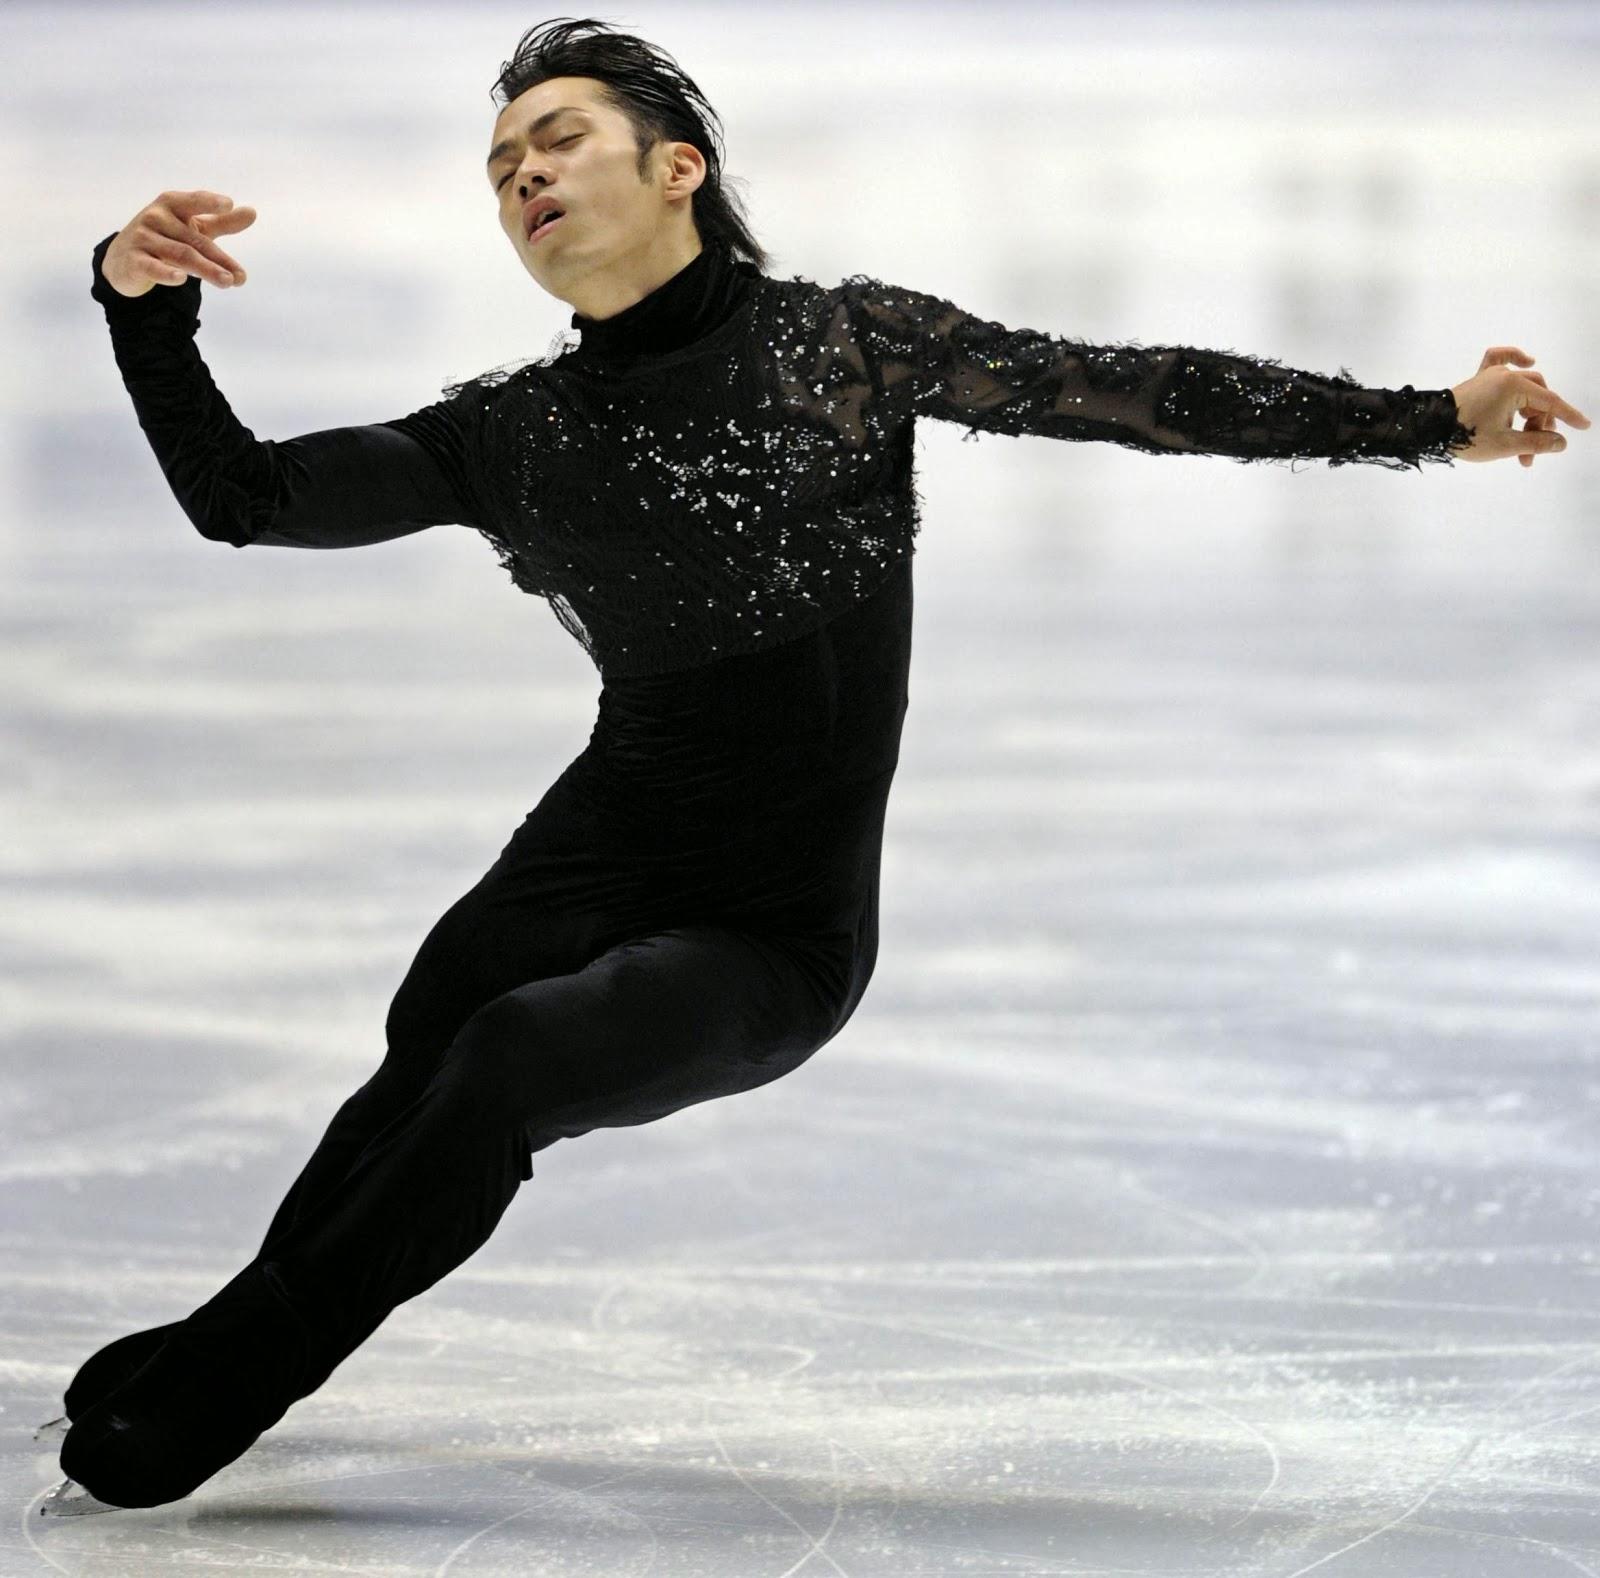 Daisuke Takahashi,sochi 2014,olympics 2014